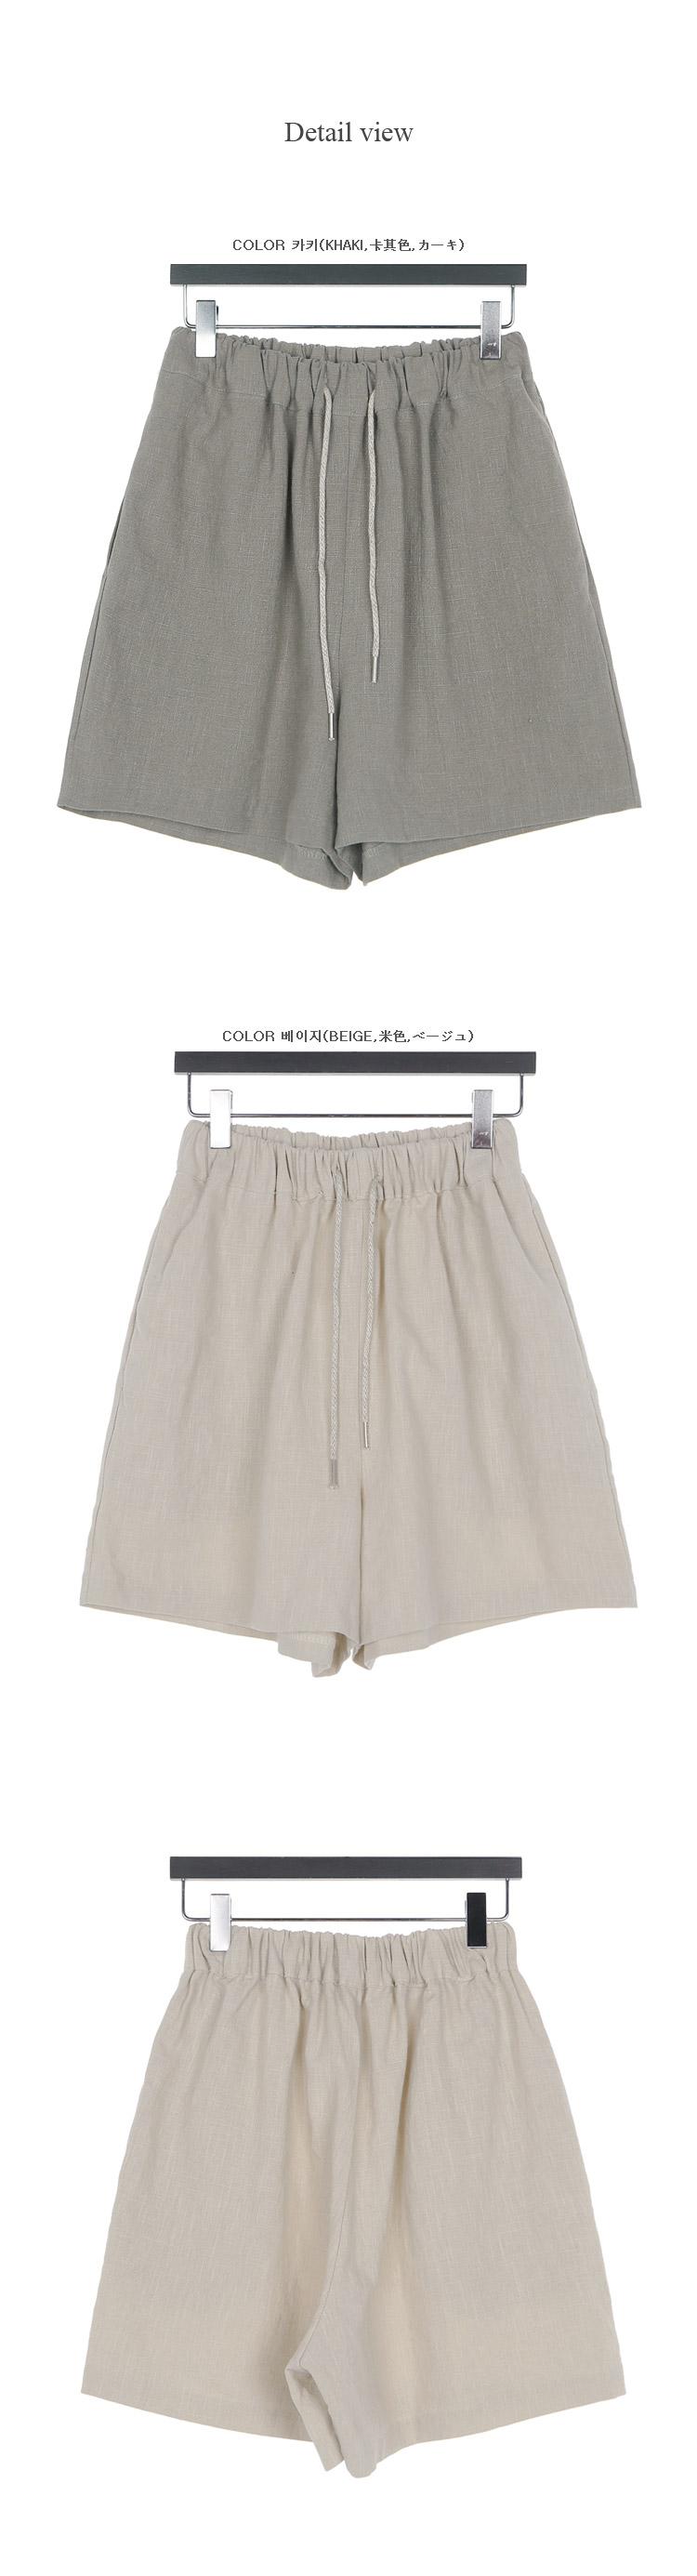 Free linen pants